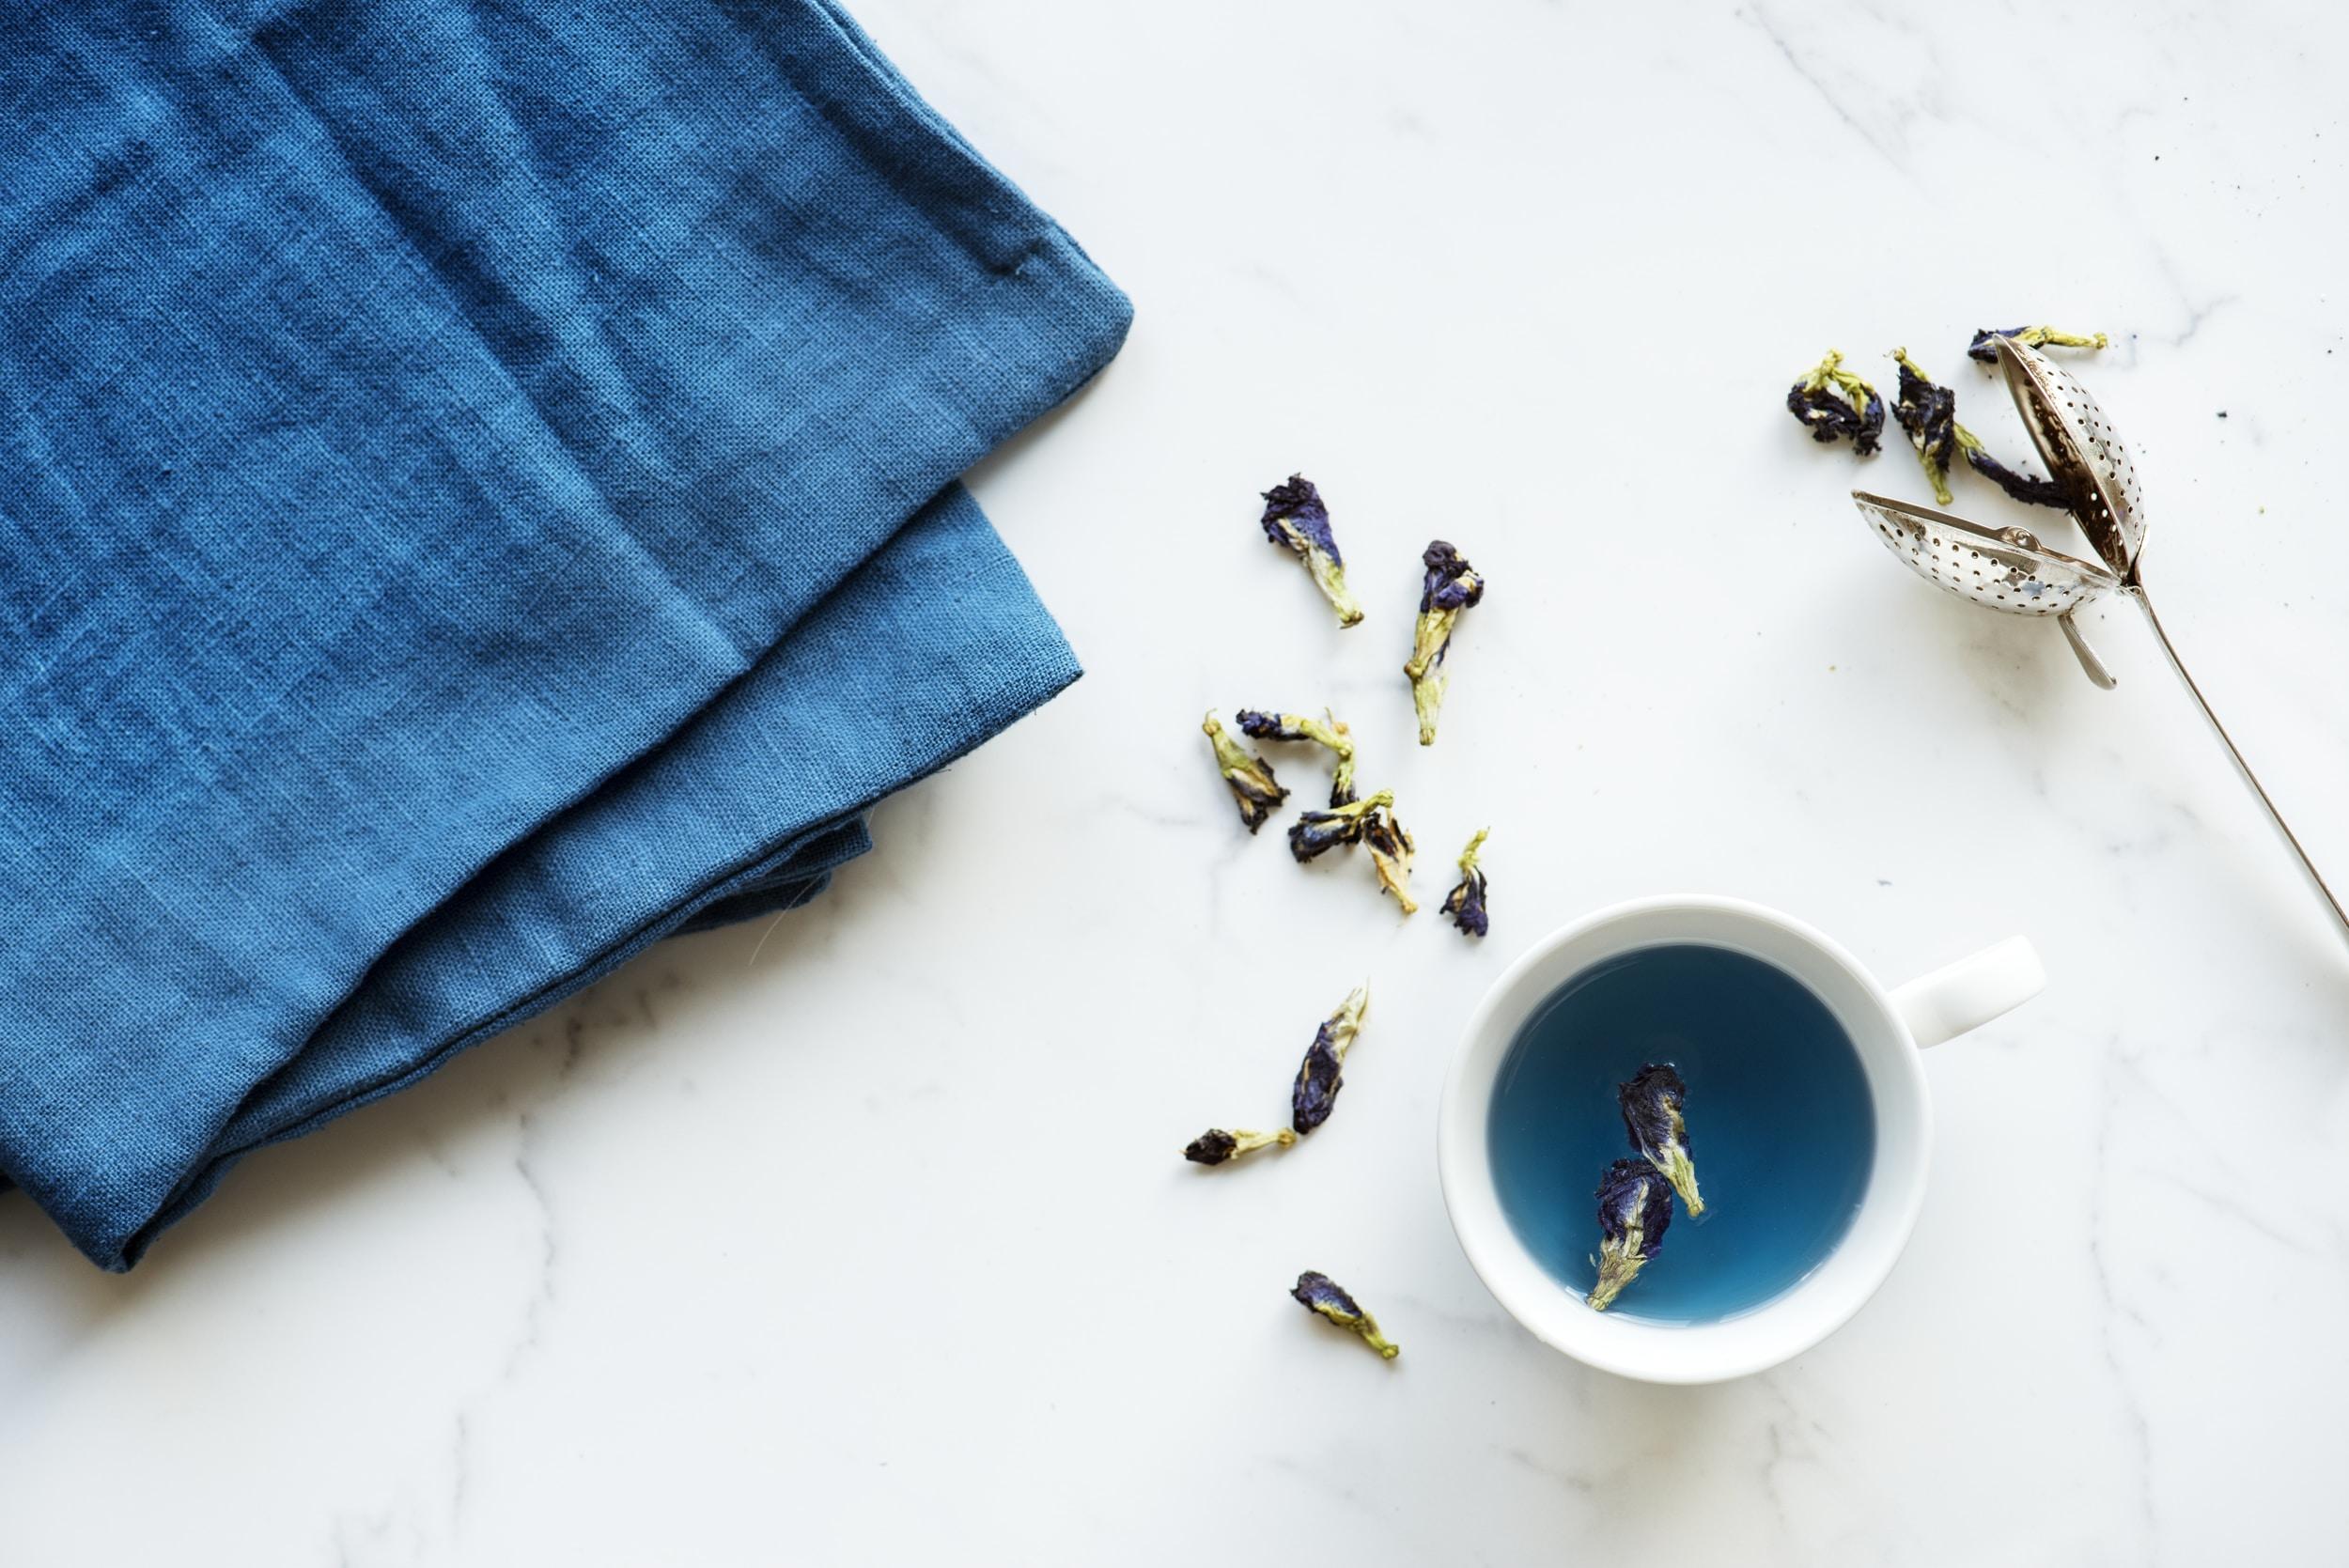 white ceramic mug beside blue textile